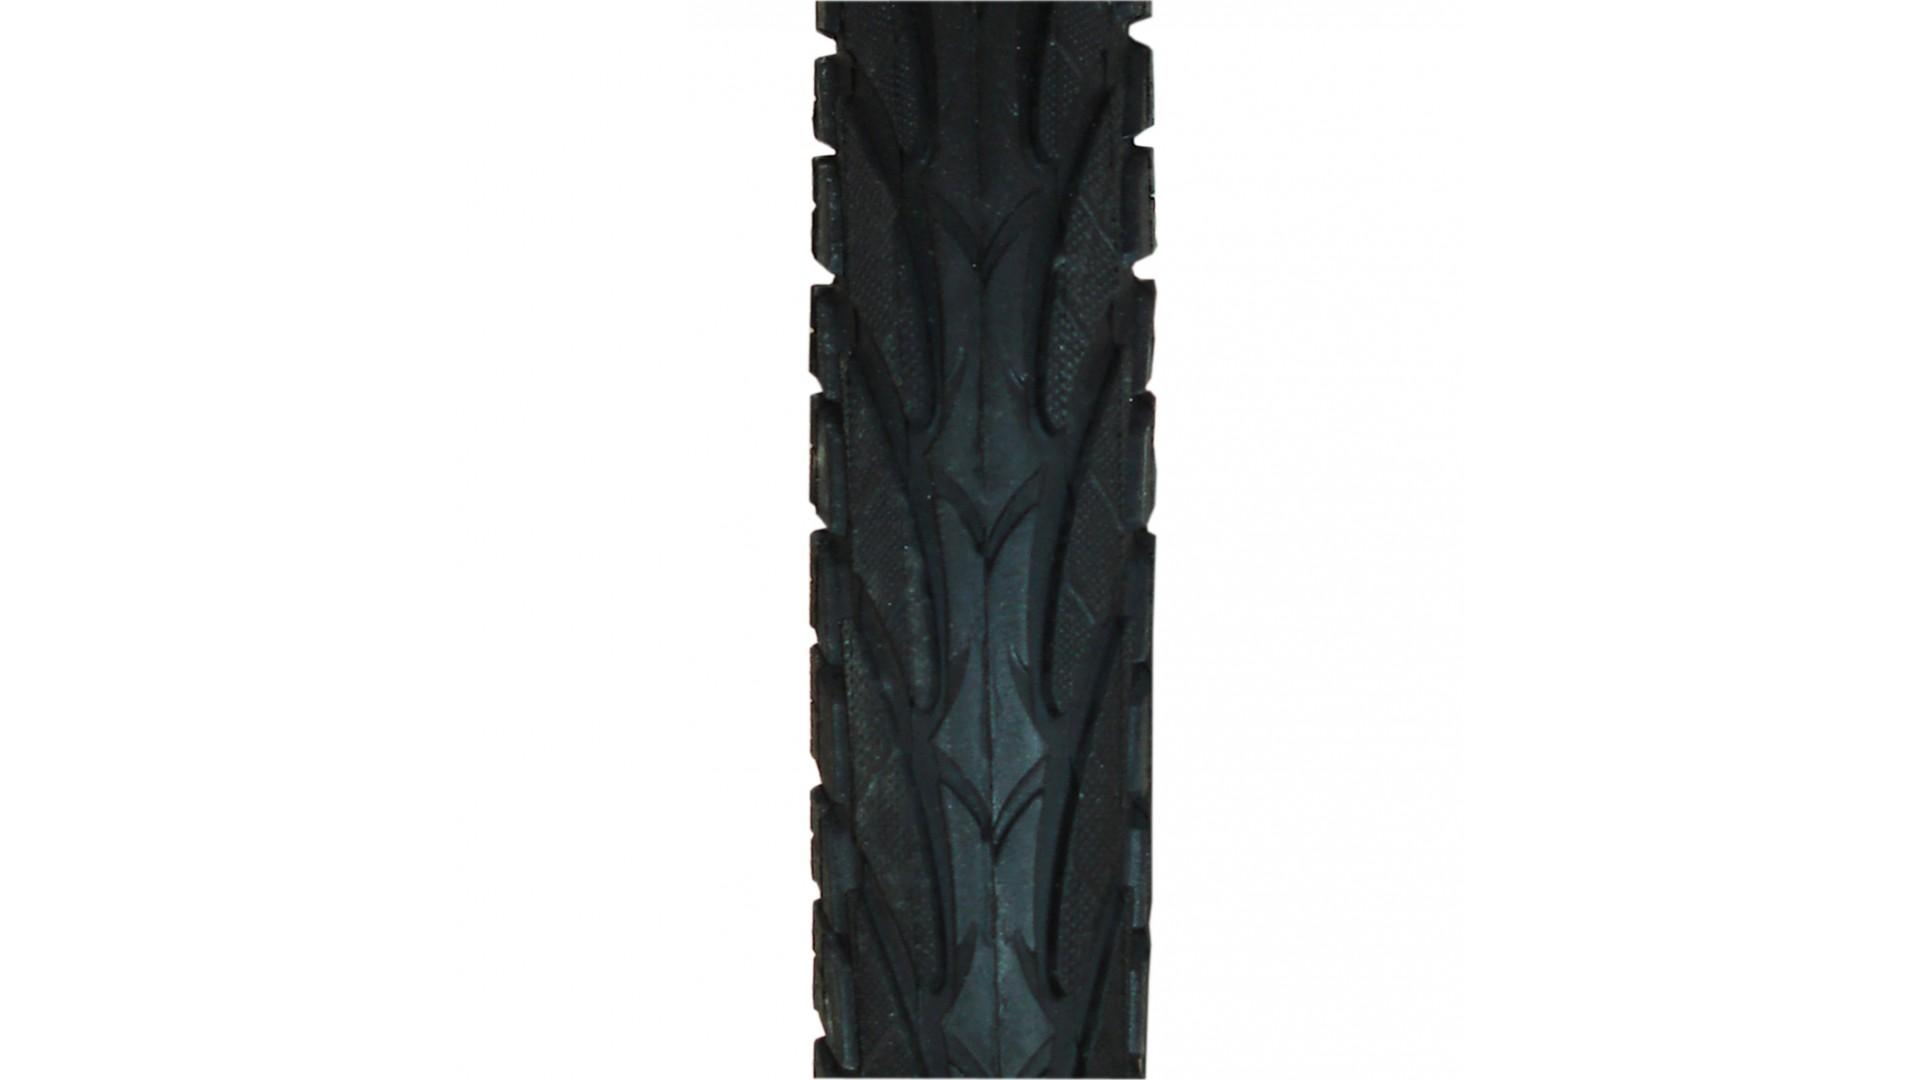 Покрышка Maxxis 26x1.75 Overdrive, Kevlar Belt